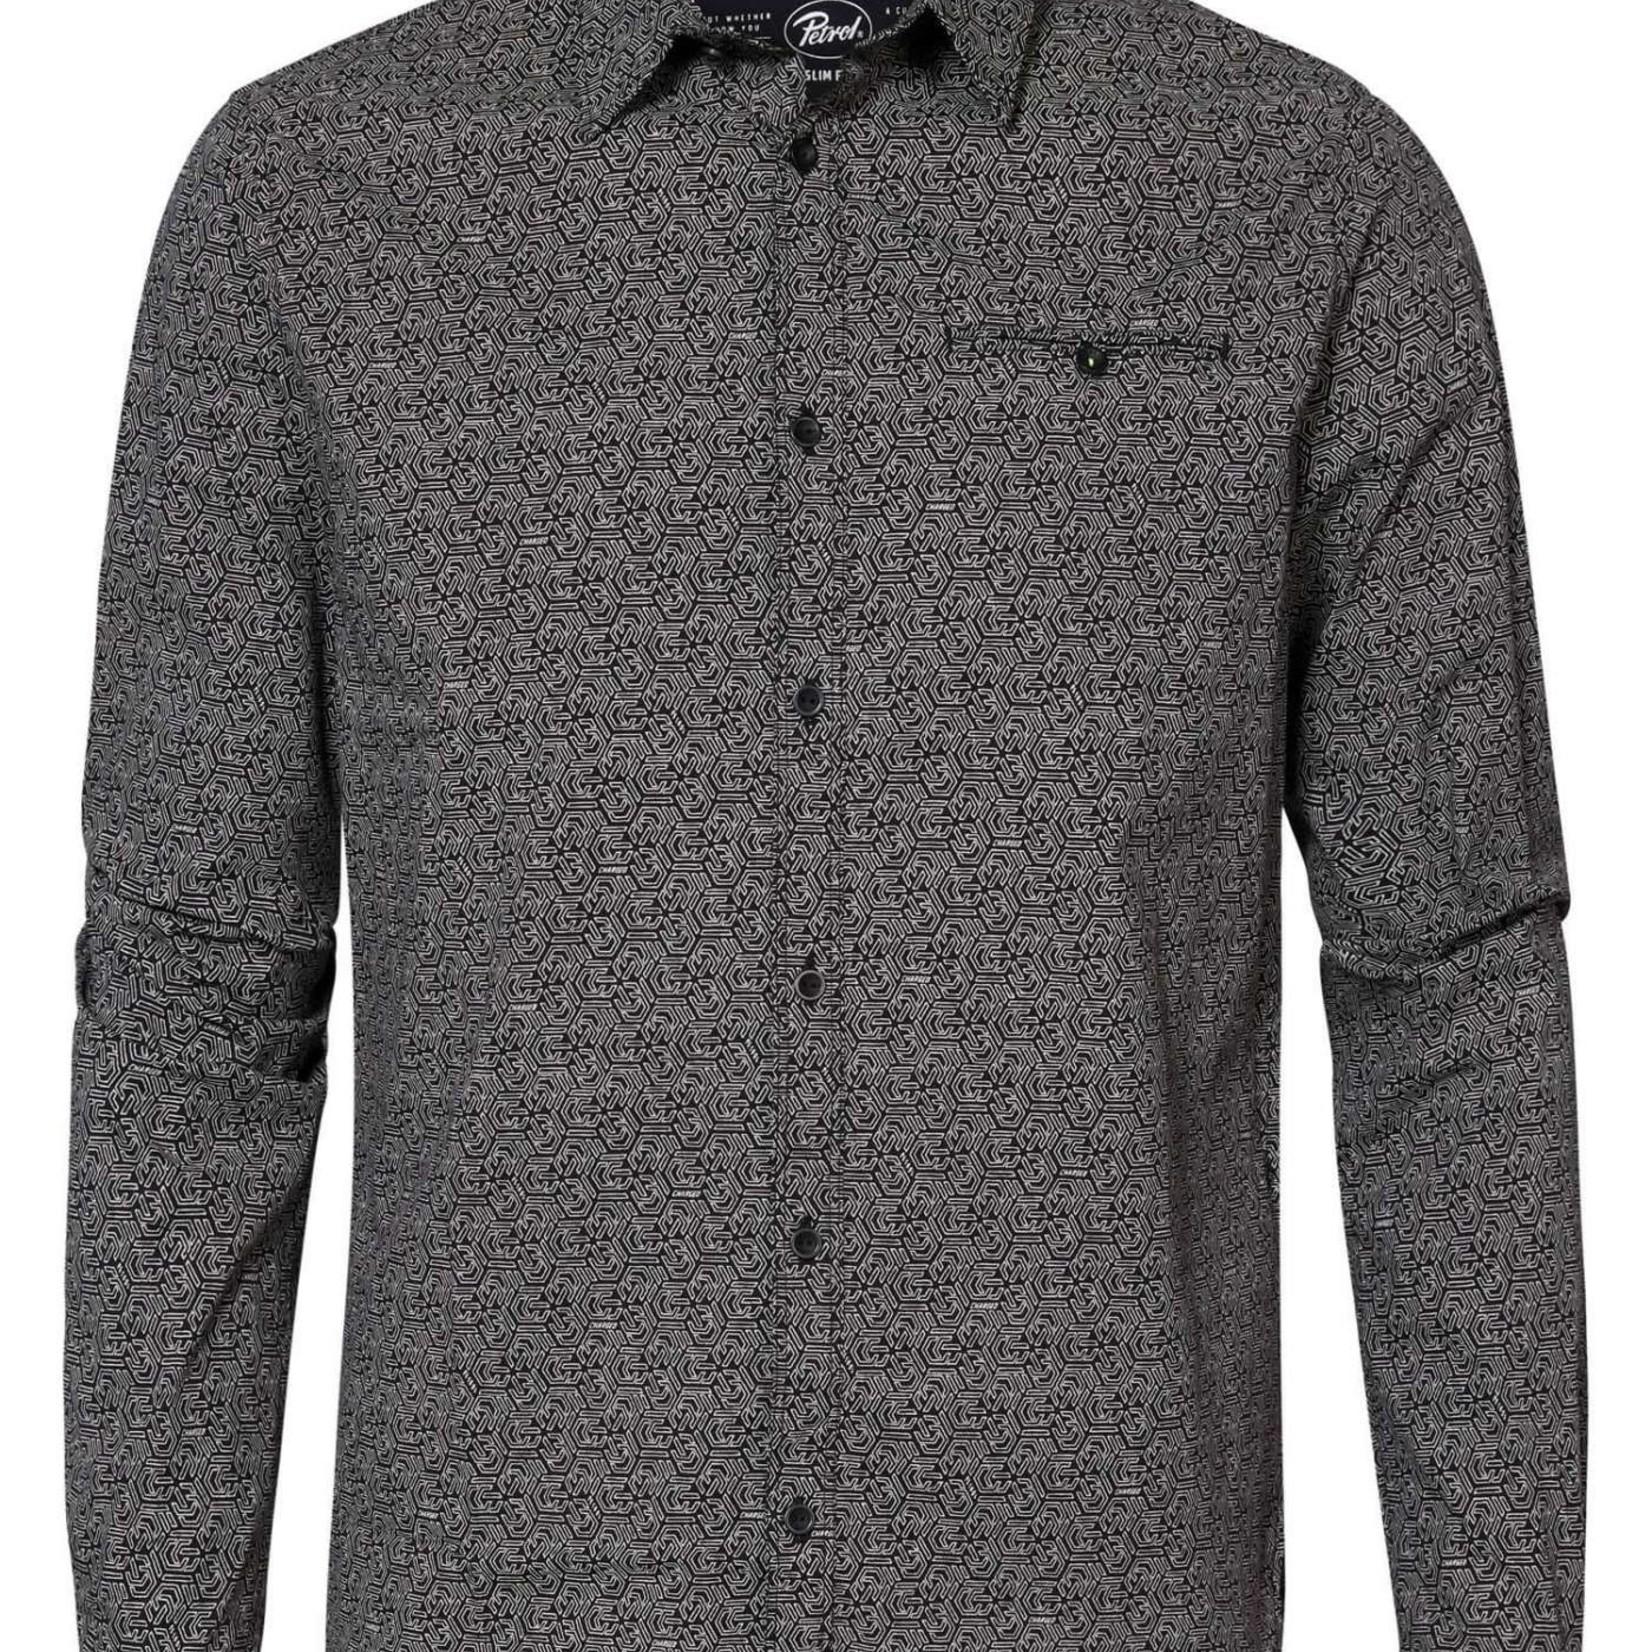 PETROL SHIRT LS, blouse